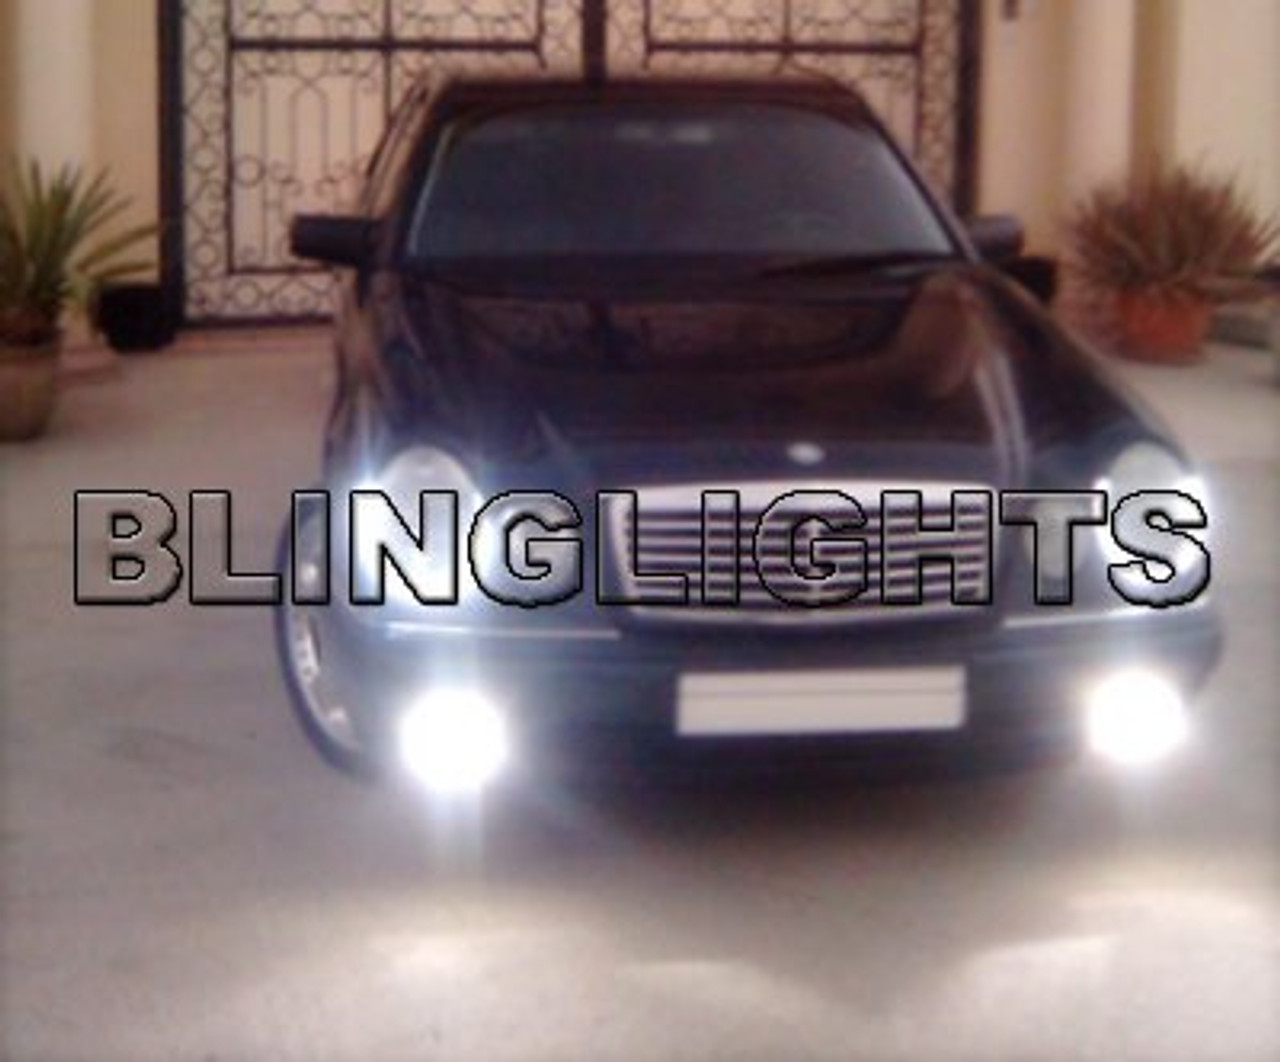 1996 1997 mercedes benz e300 xenon fog lights driving lamps foglamps kit e 300 diesel [ 1280 x 1062 Pixel ]